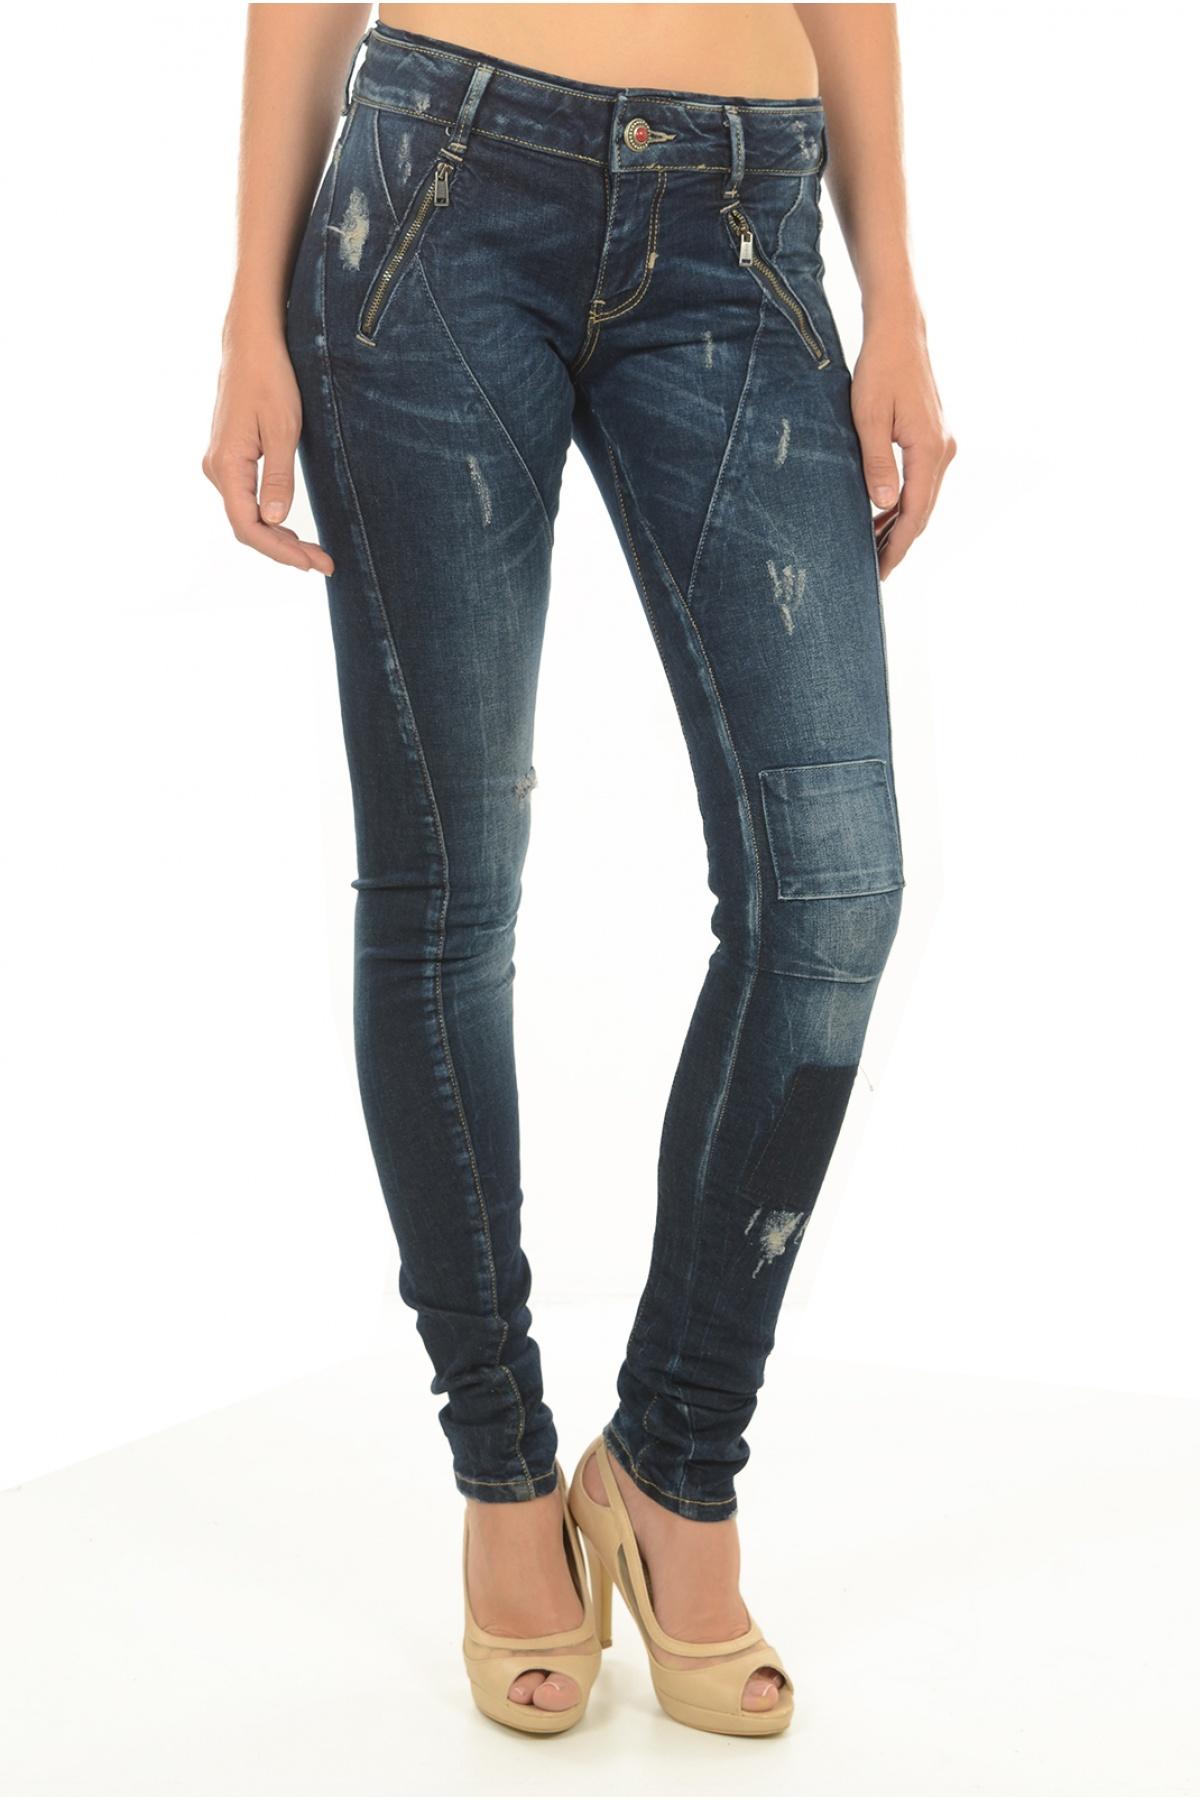 GUESS Jeans Letitia